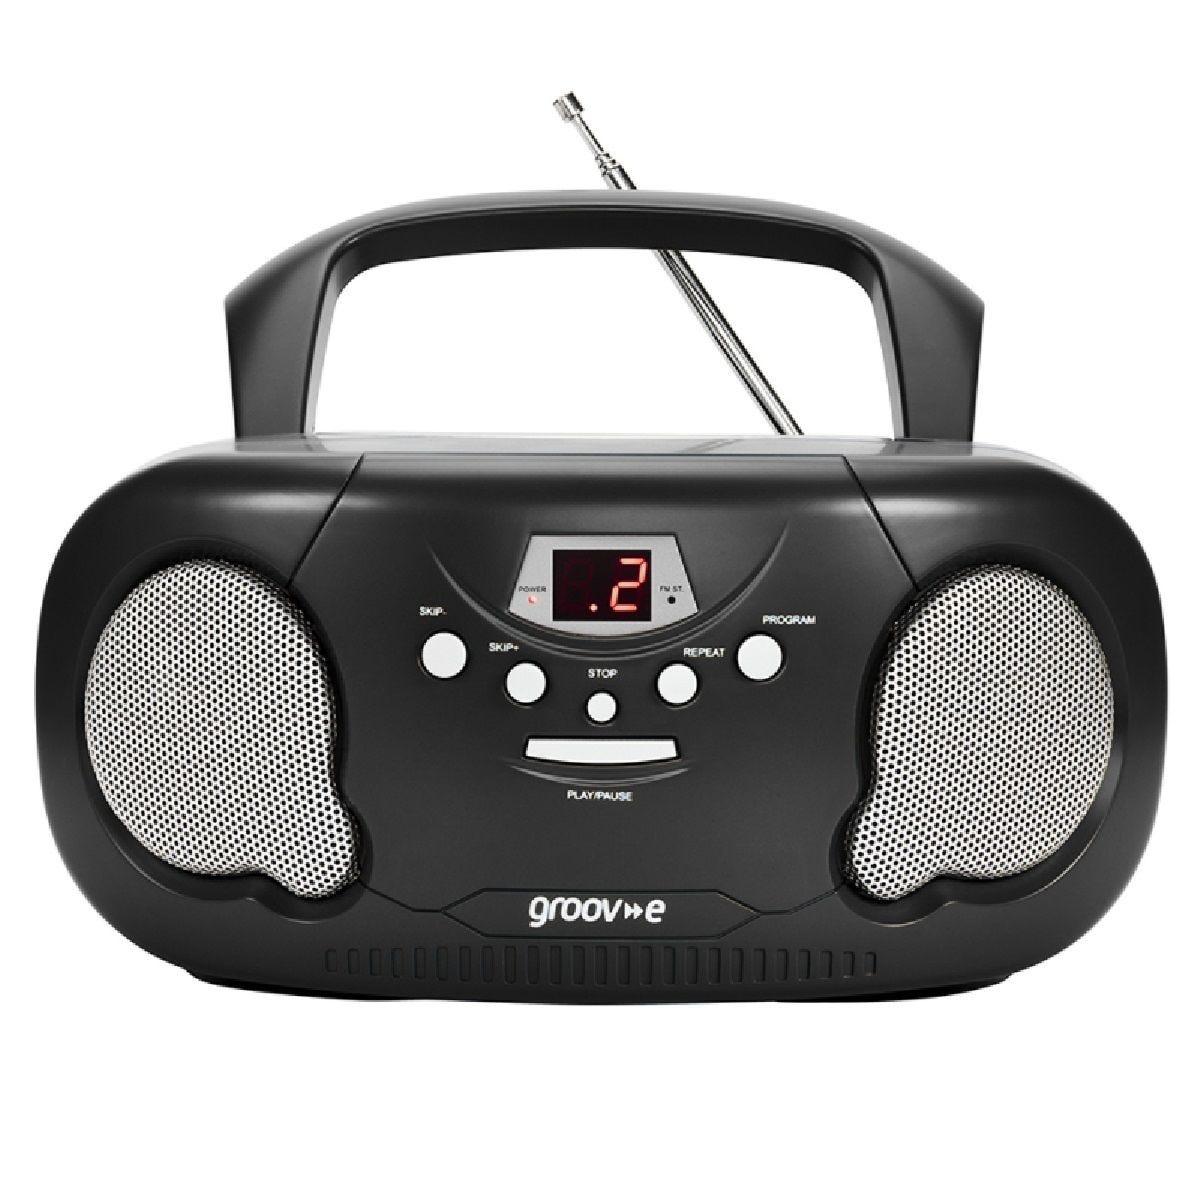 Groov-e Original Boombox Portable CD Player with Radio - Black